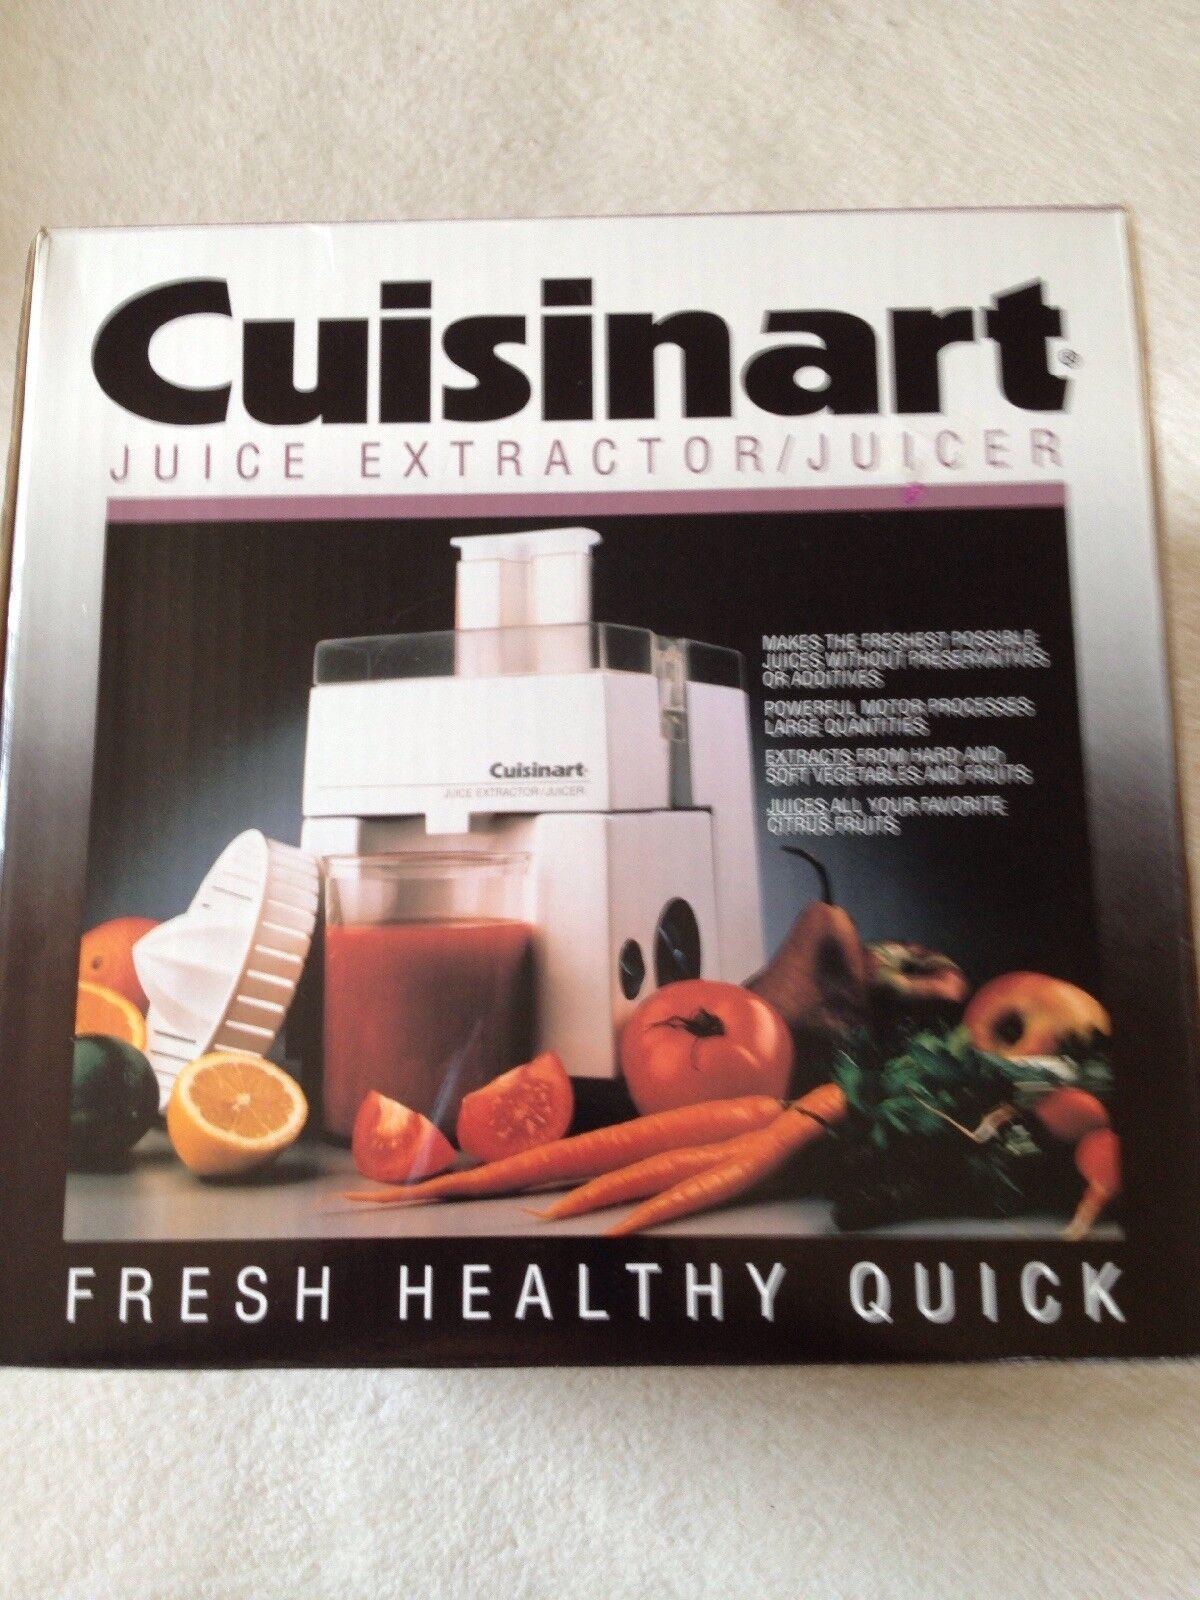 New Cuisinart Juice Extractor/Juicer 200w Model JE-4 w/Stain